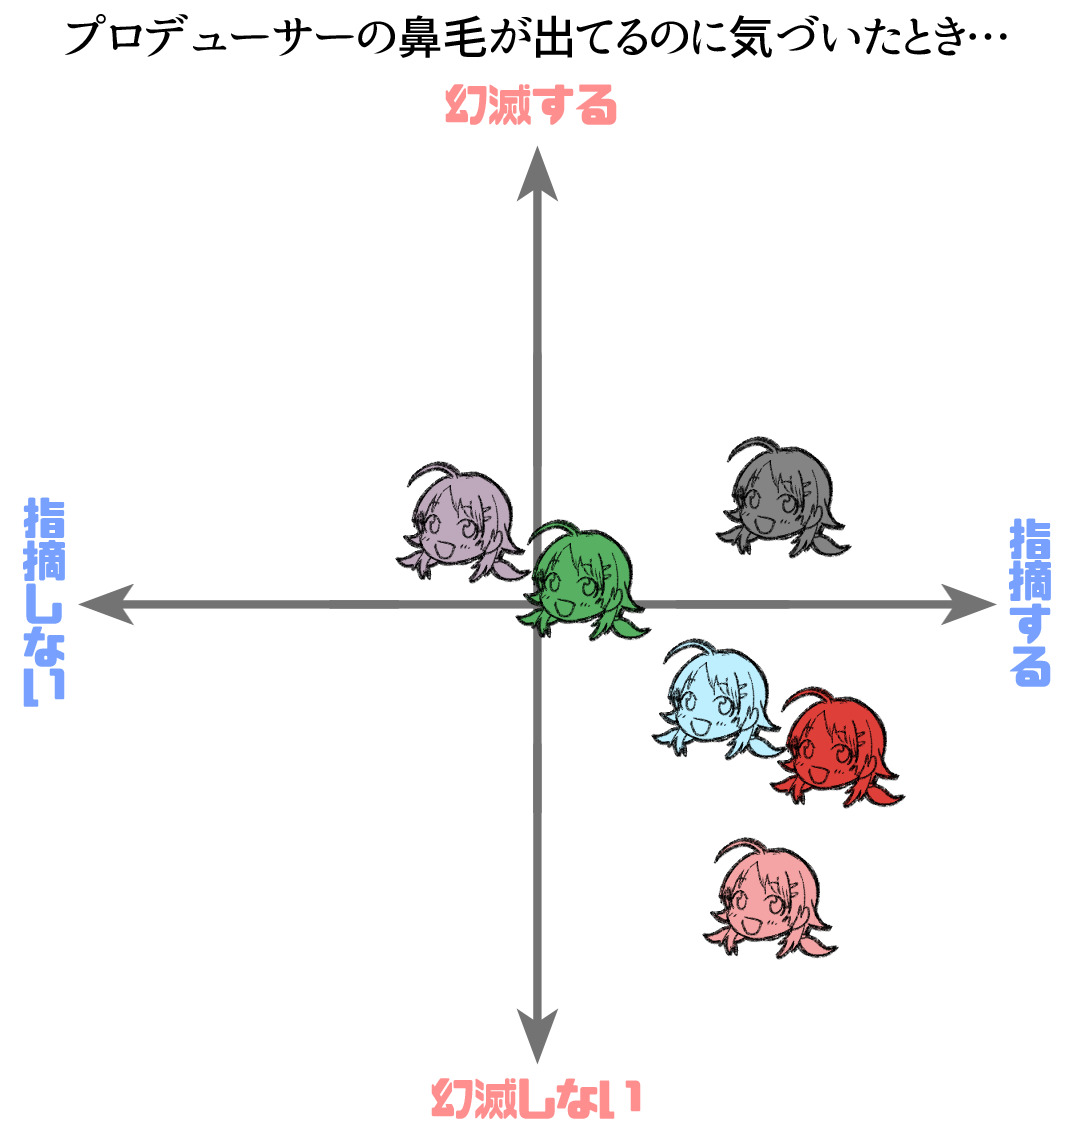 f:id:hoshi_sano:20200414111410j:image:w400